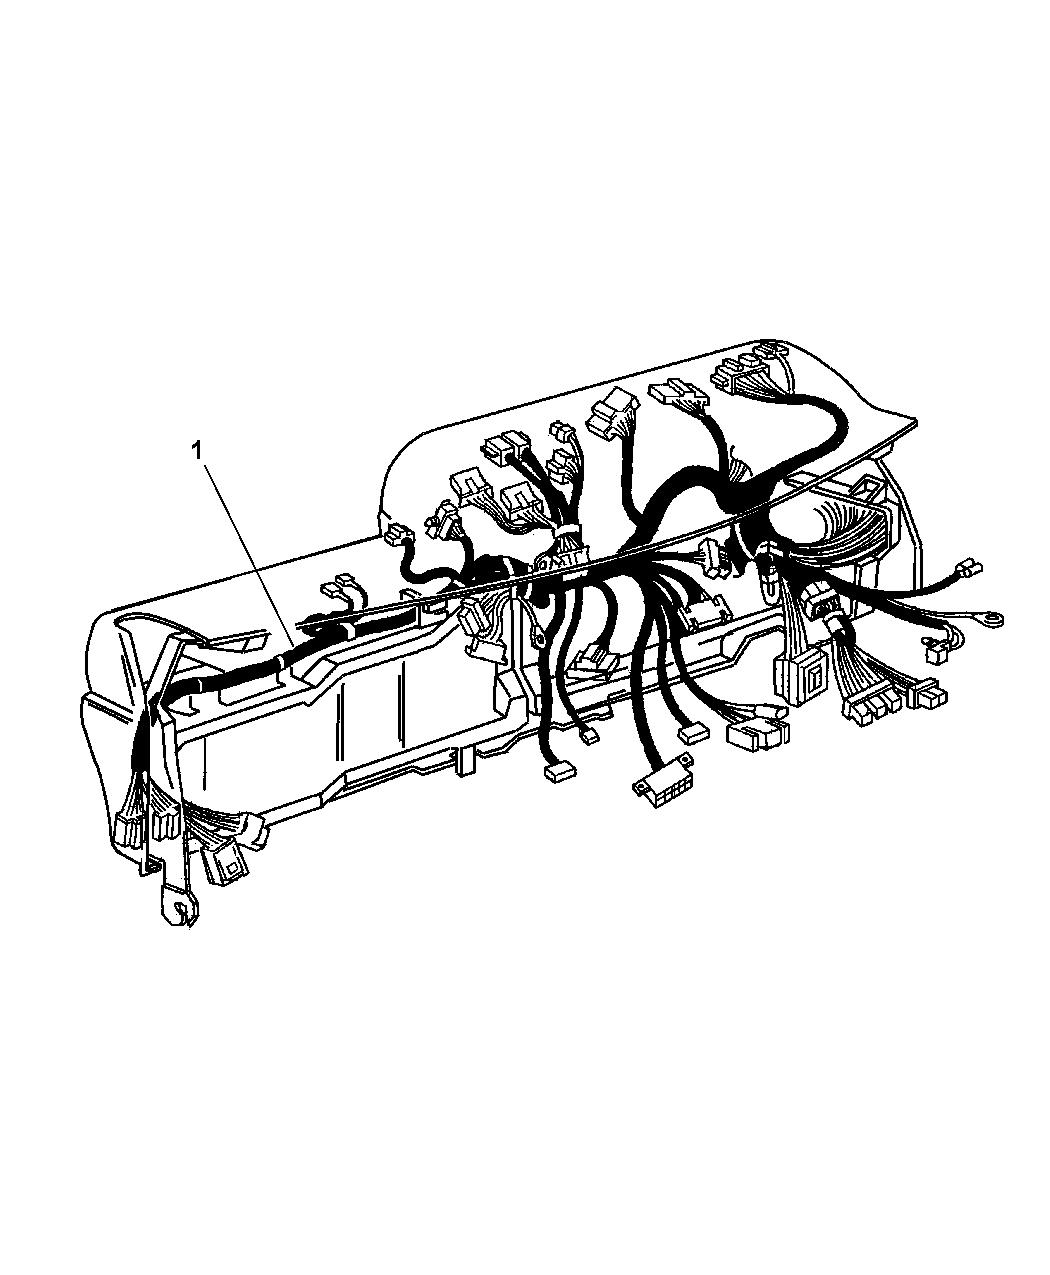 Dodge Ram Regular Cab Wiring